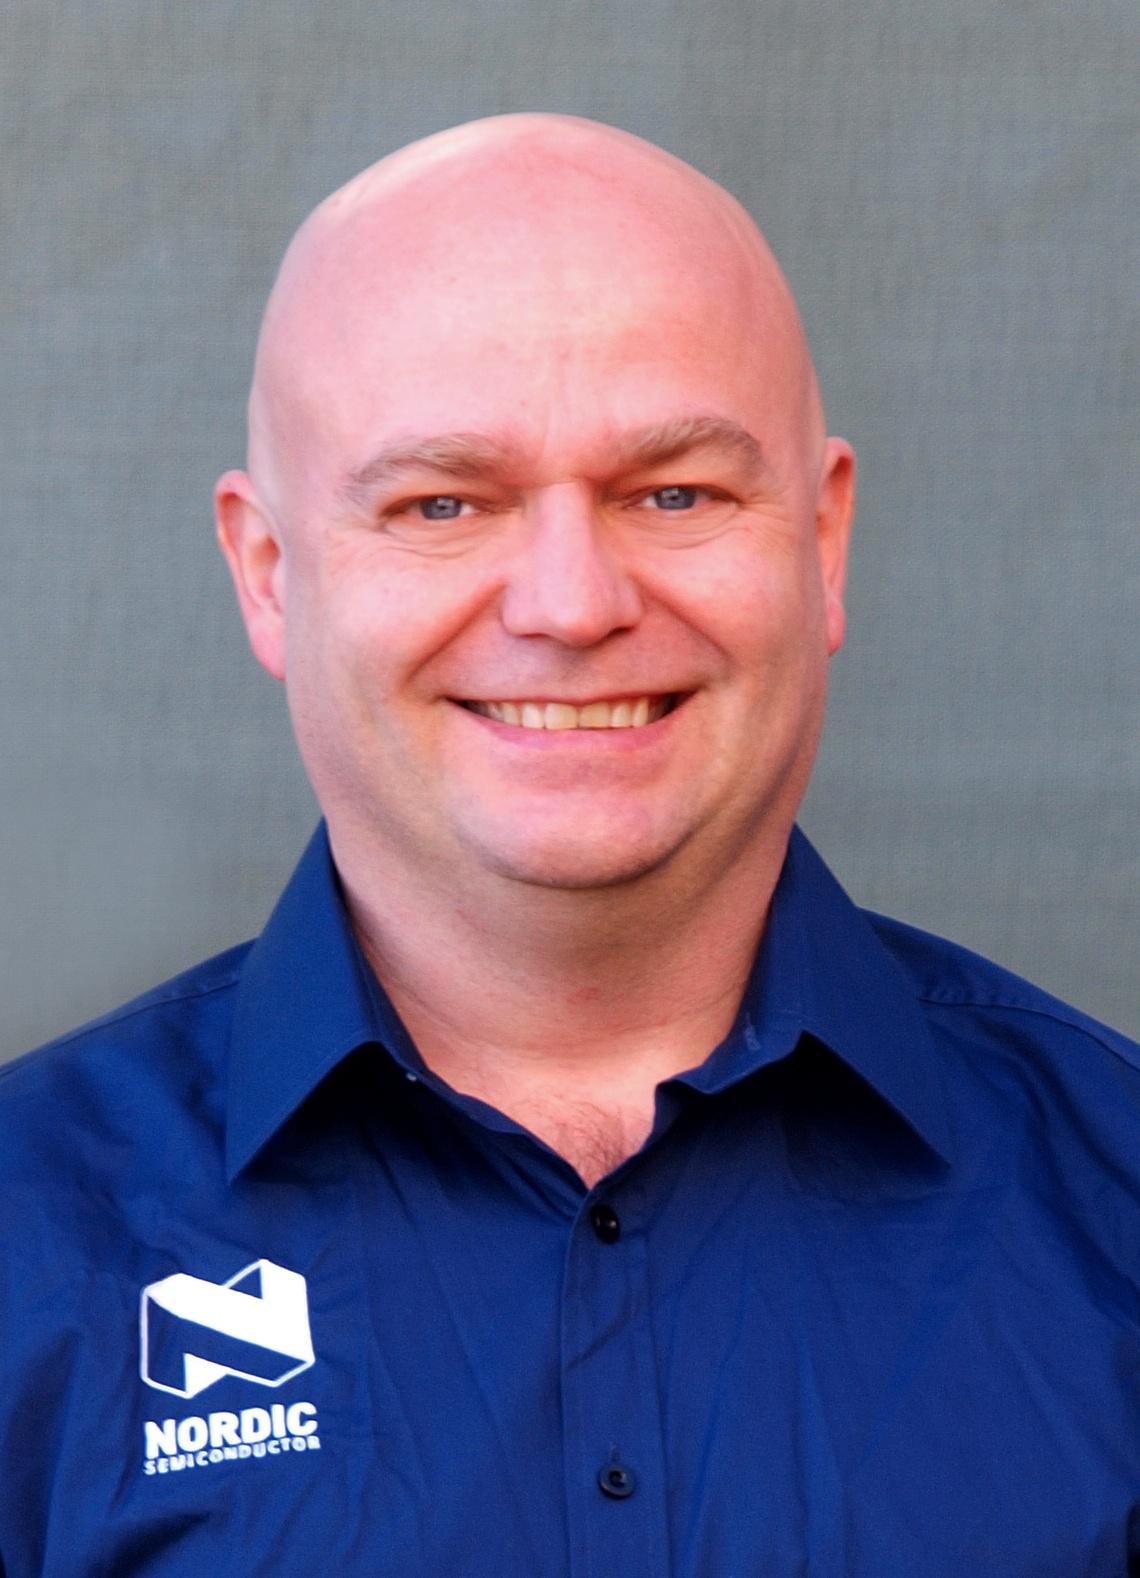 Pål Kastnes's photo